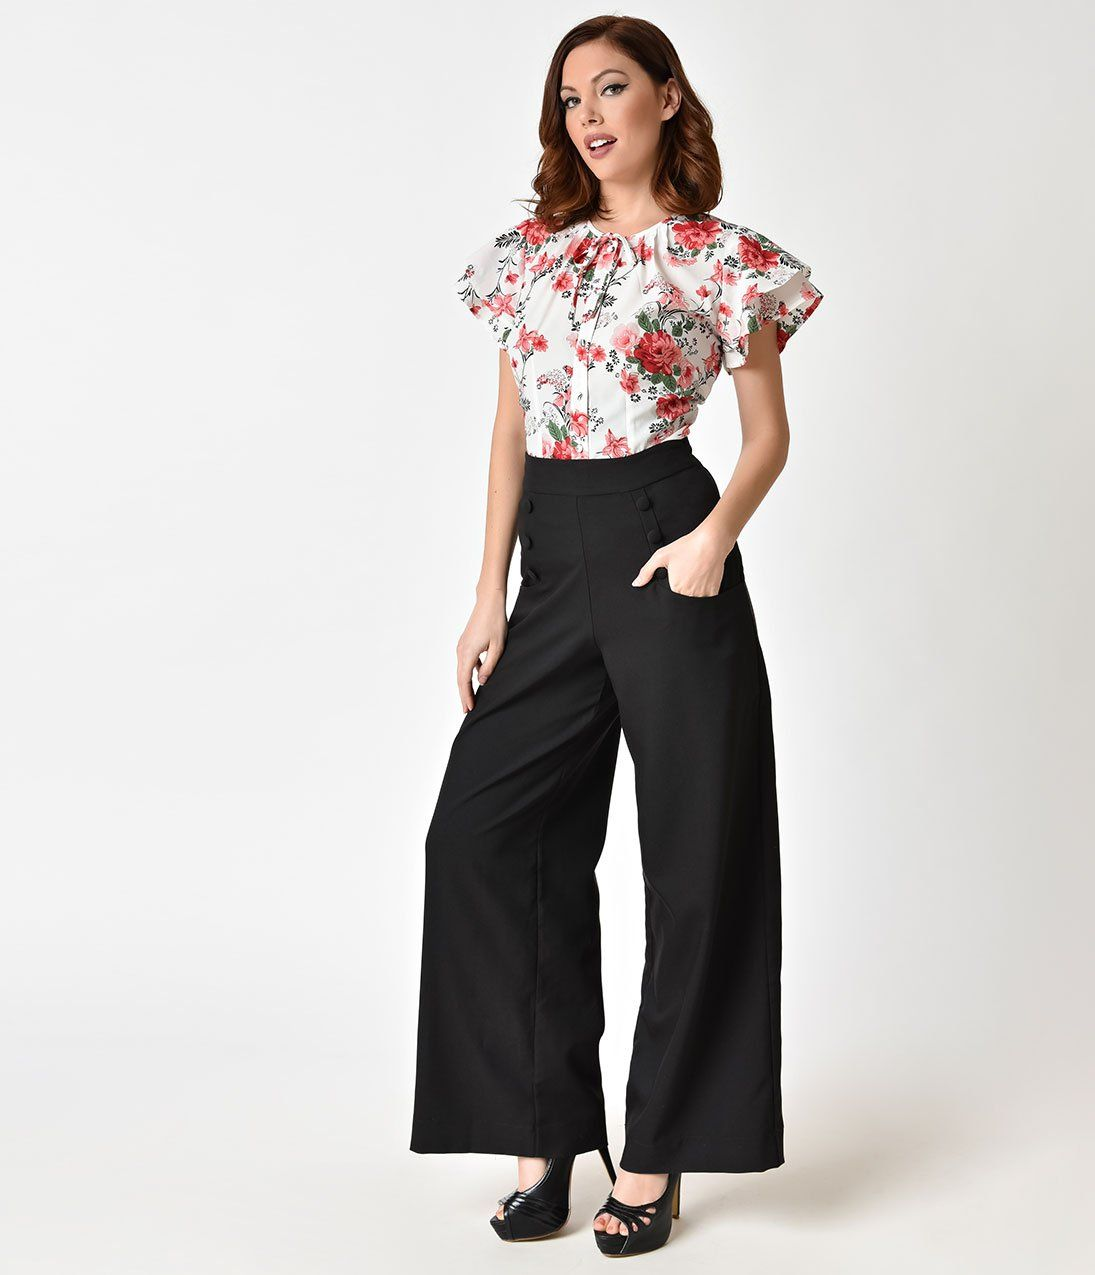 3981c33d0f7 1950s Fashion History  Women s Clothing Unique Vintage 1940S Style Black  High Waist Sailor Ginger Pants  62.00 AT vintagedancer.com